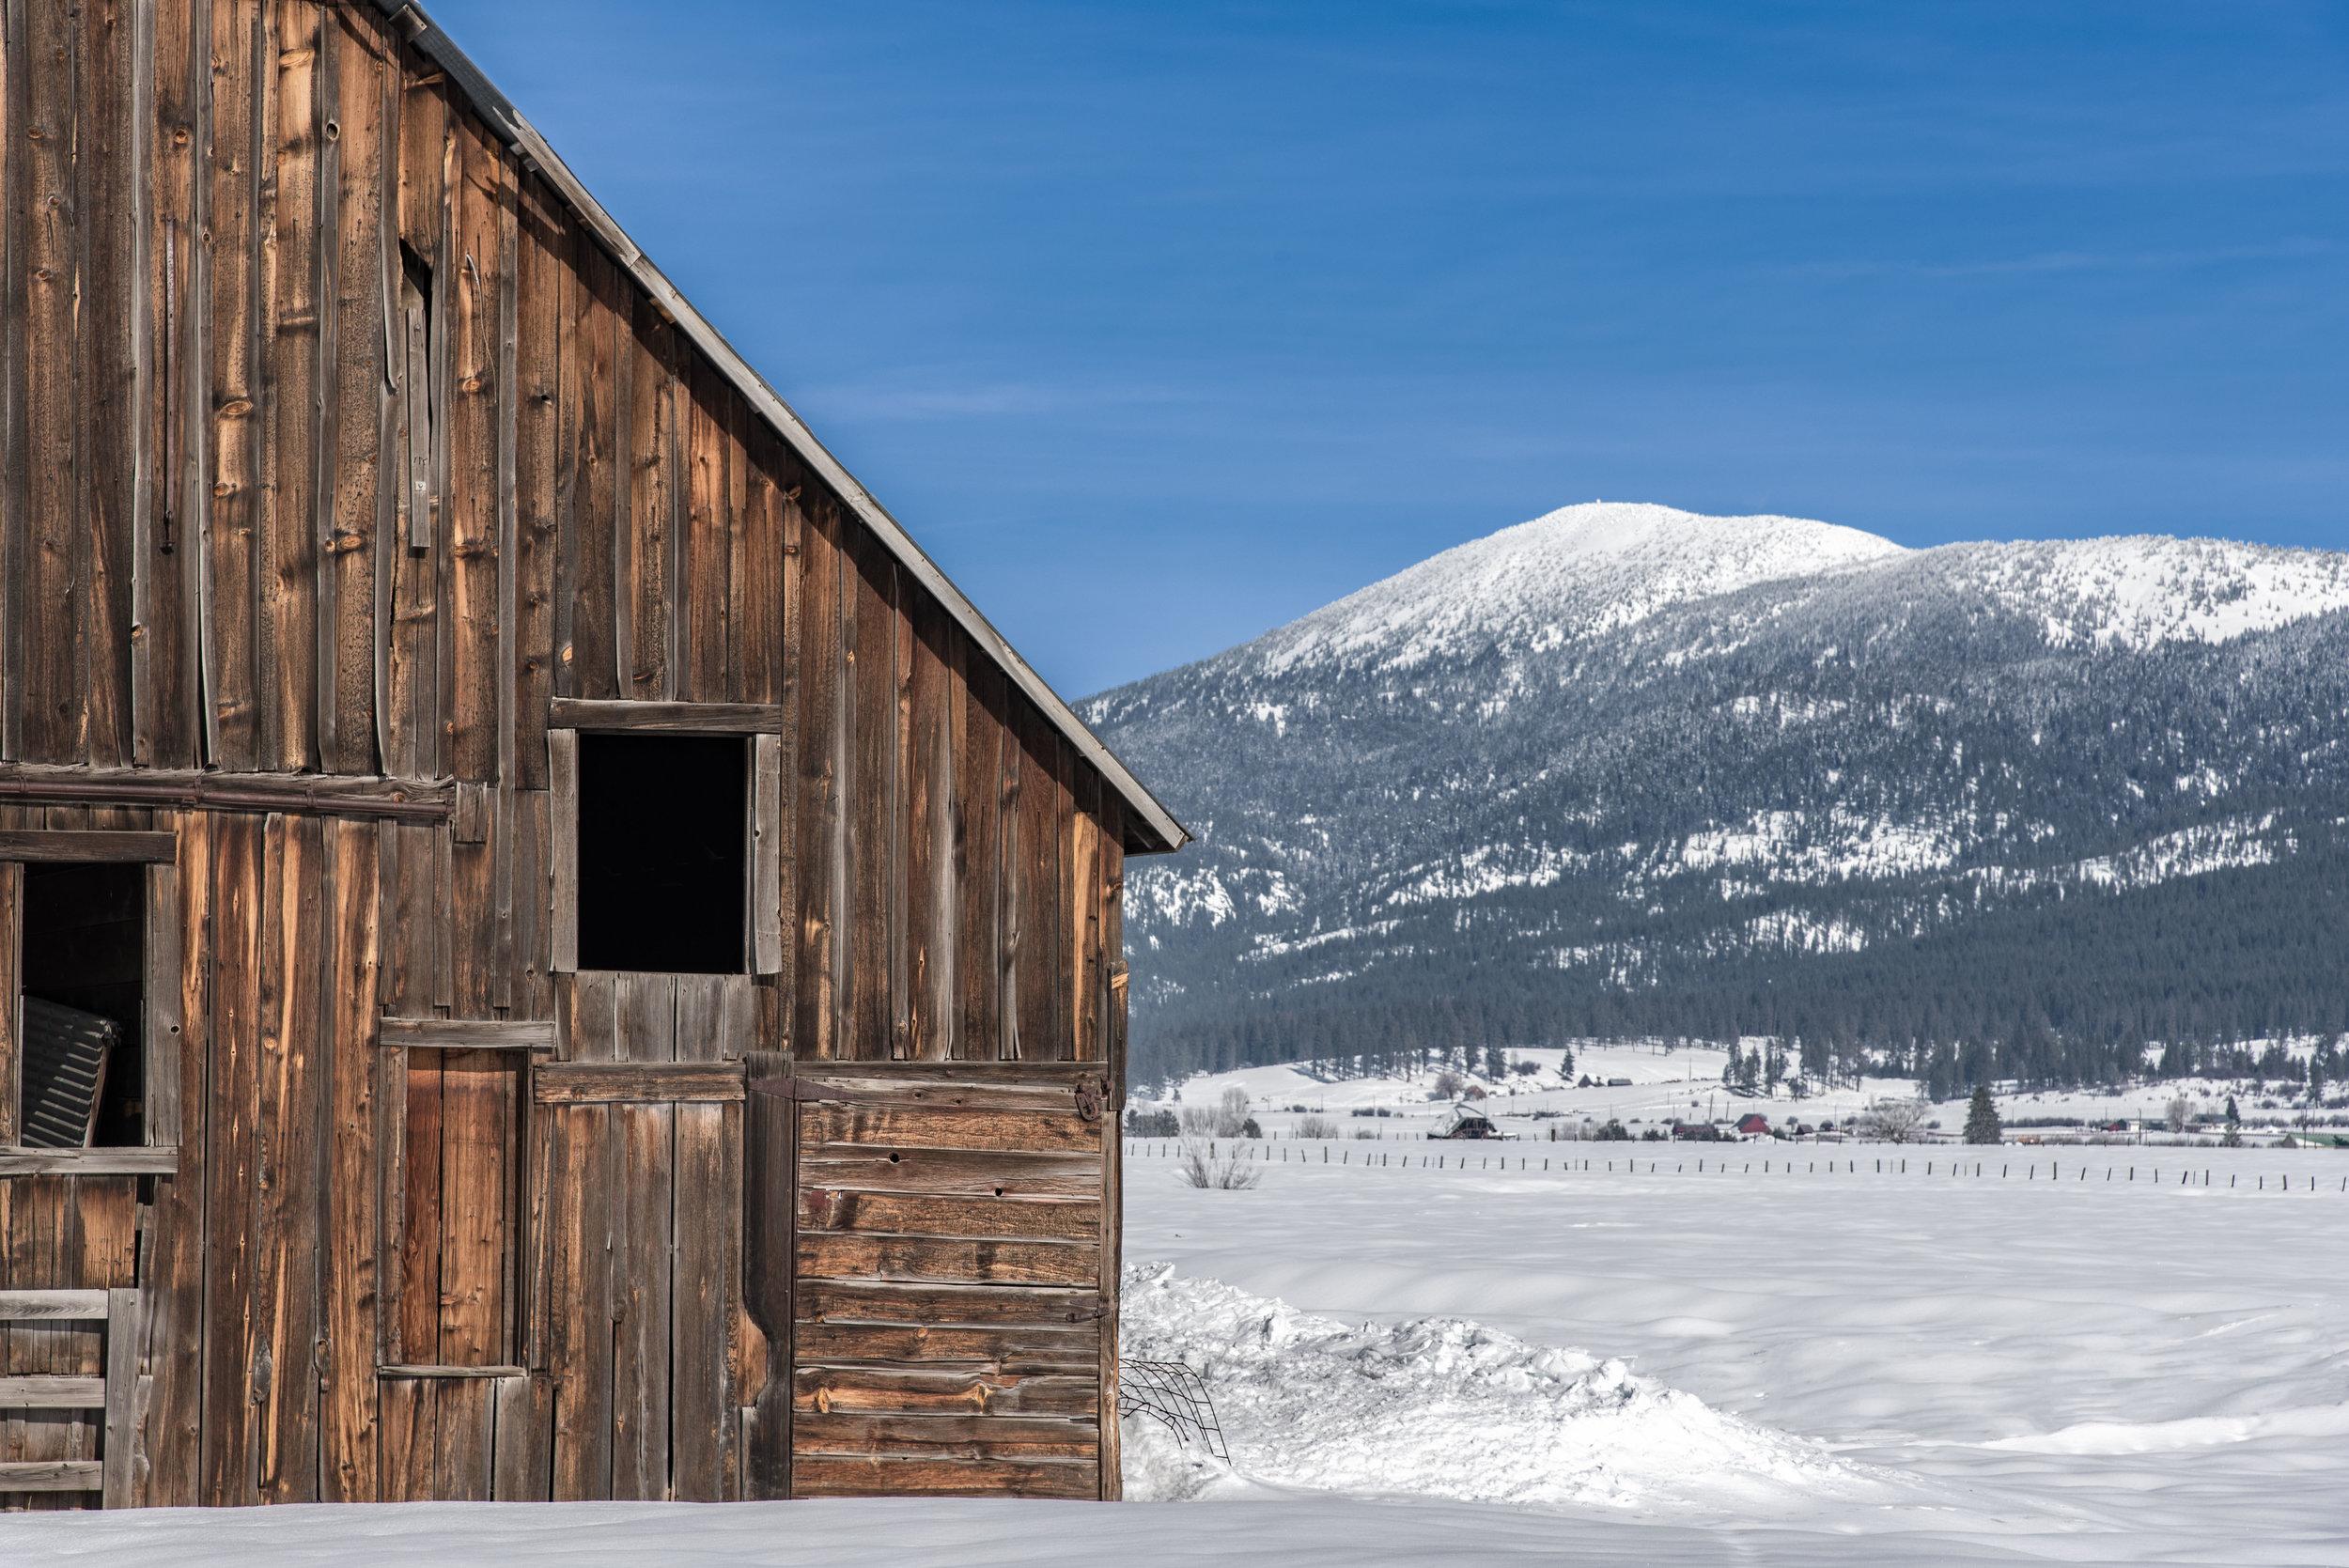 Big Barn #2